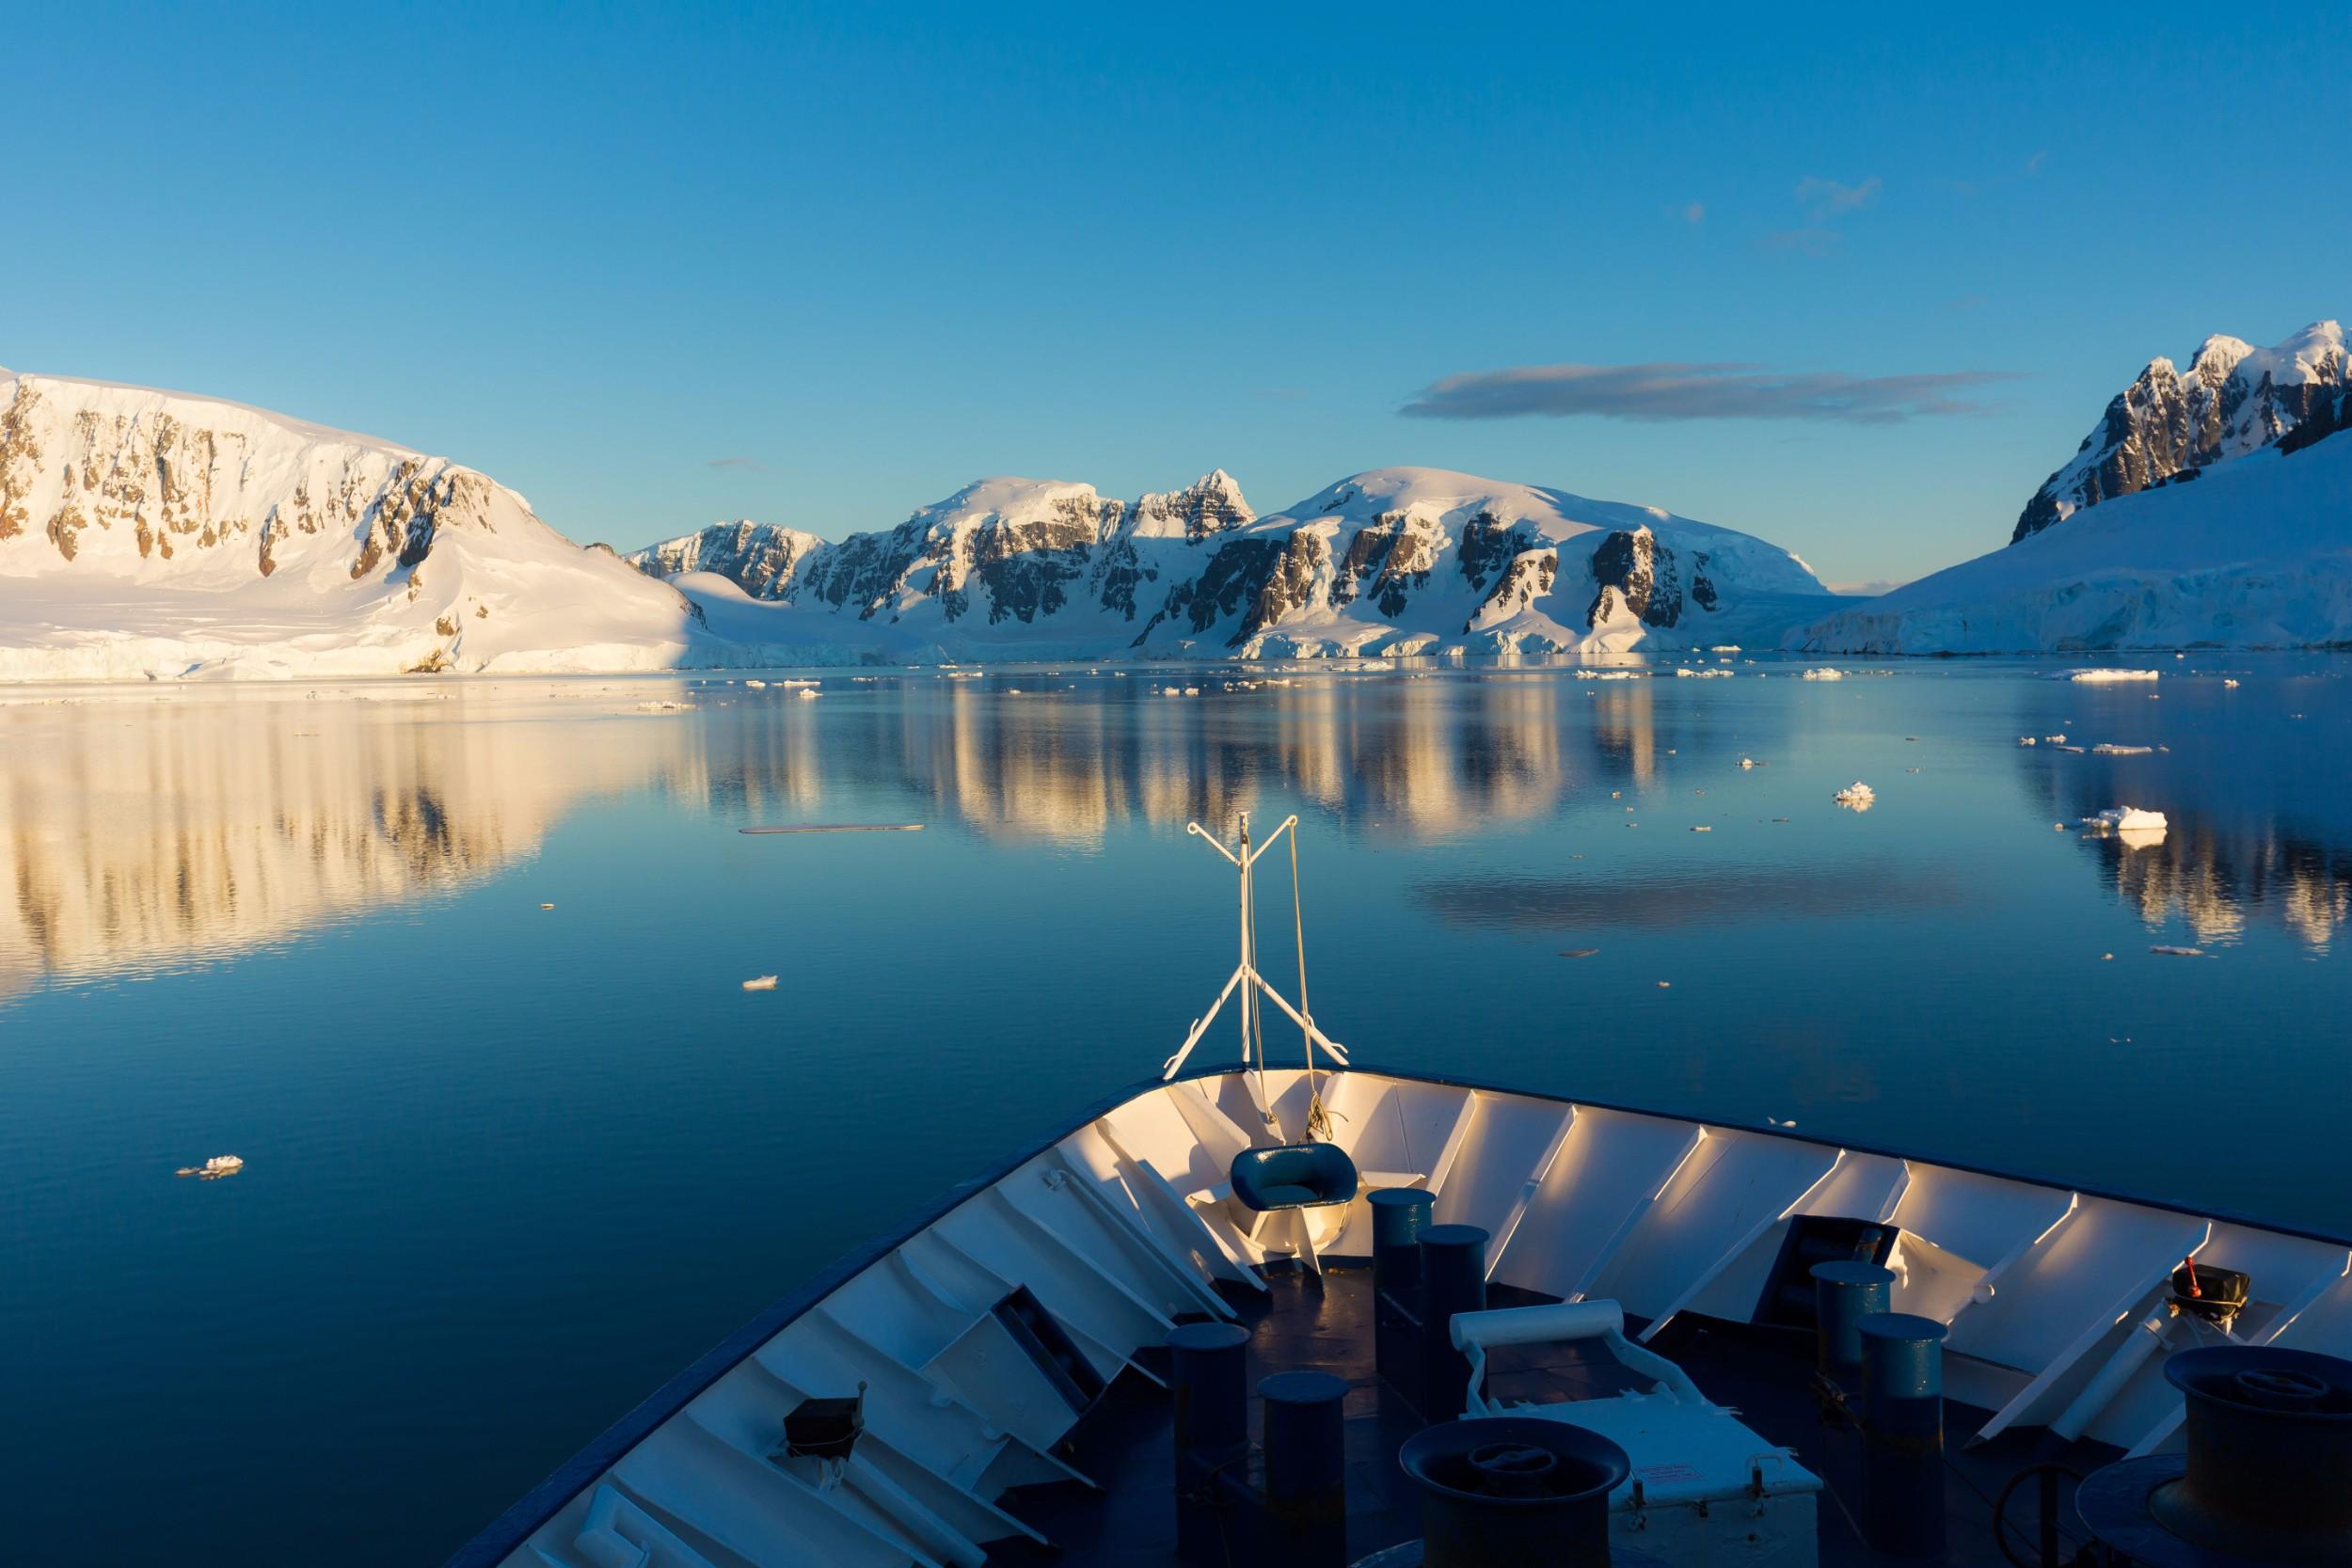 Polar Latitudes_HS_Bow_landscape_Original_16090.jpg